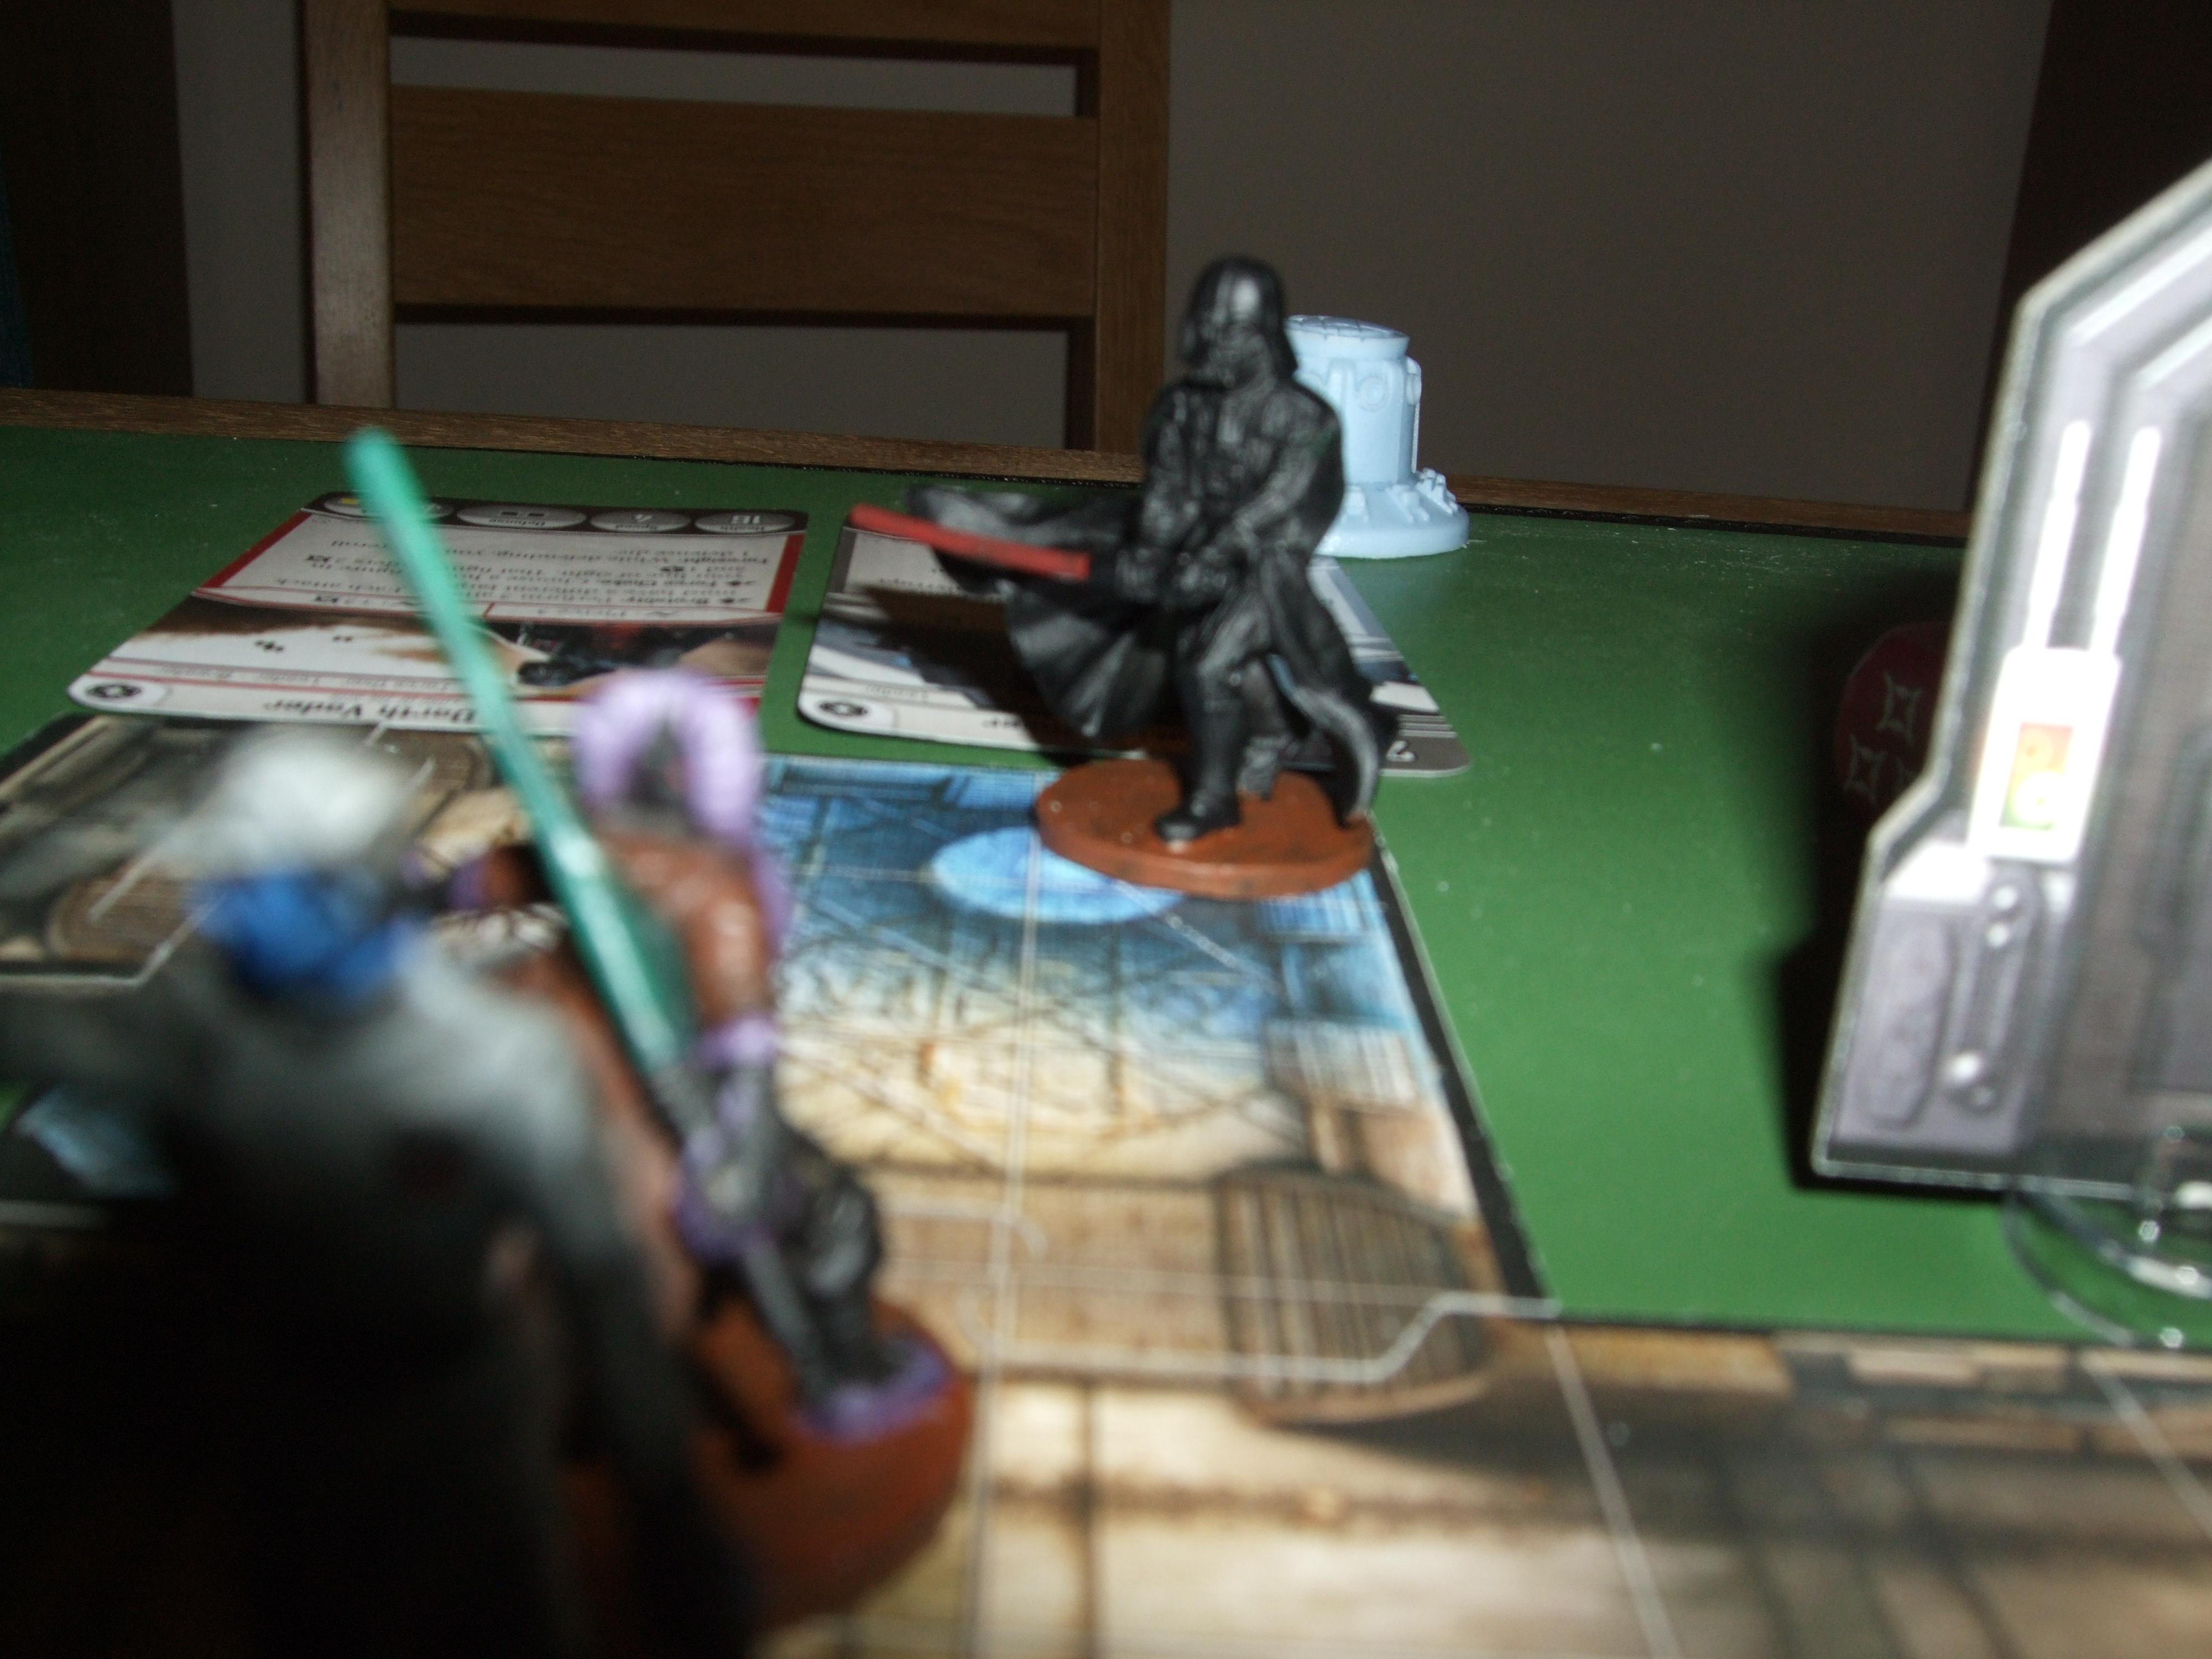 Battle Report, Campaign, Darth Vader, Imperial Assault, Jedi, Star Wars, Temptation, Wookiee